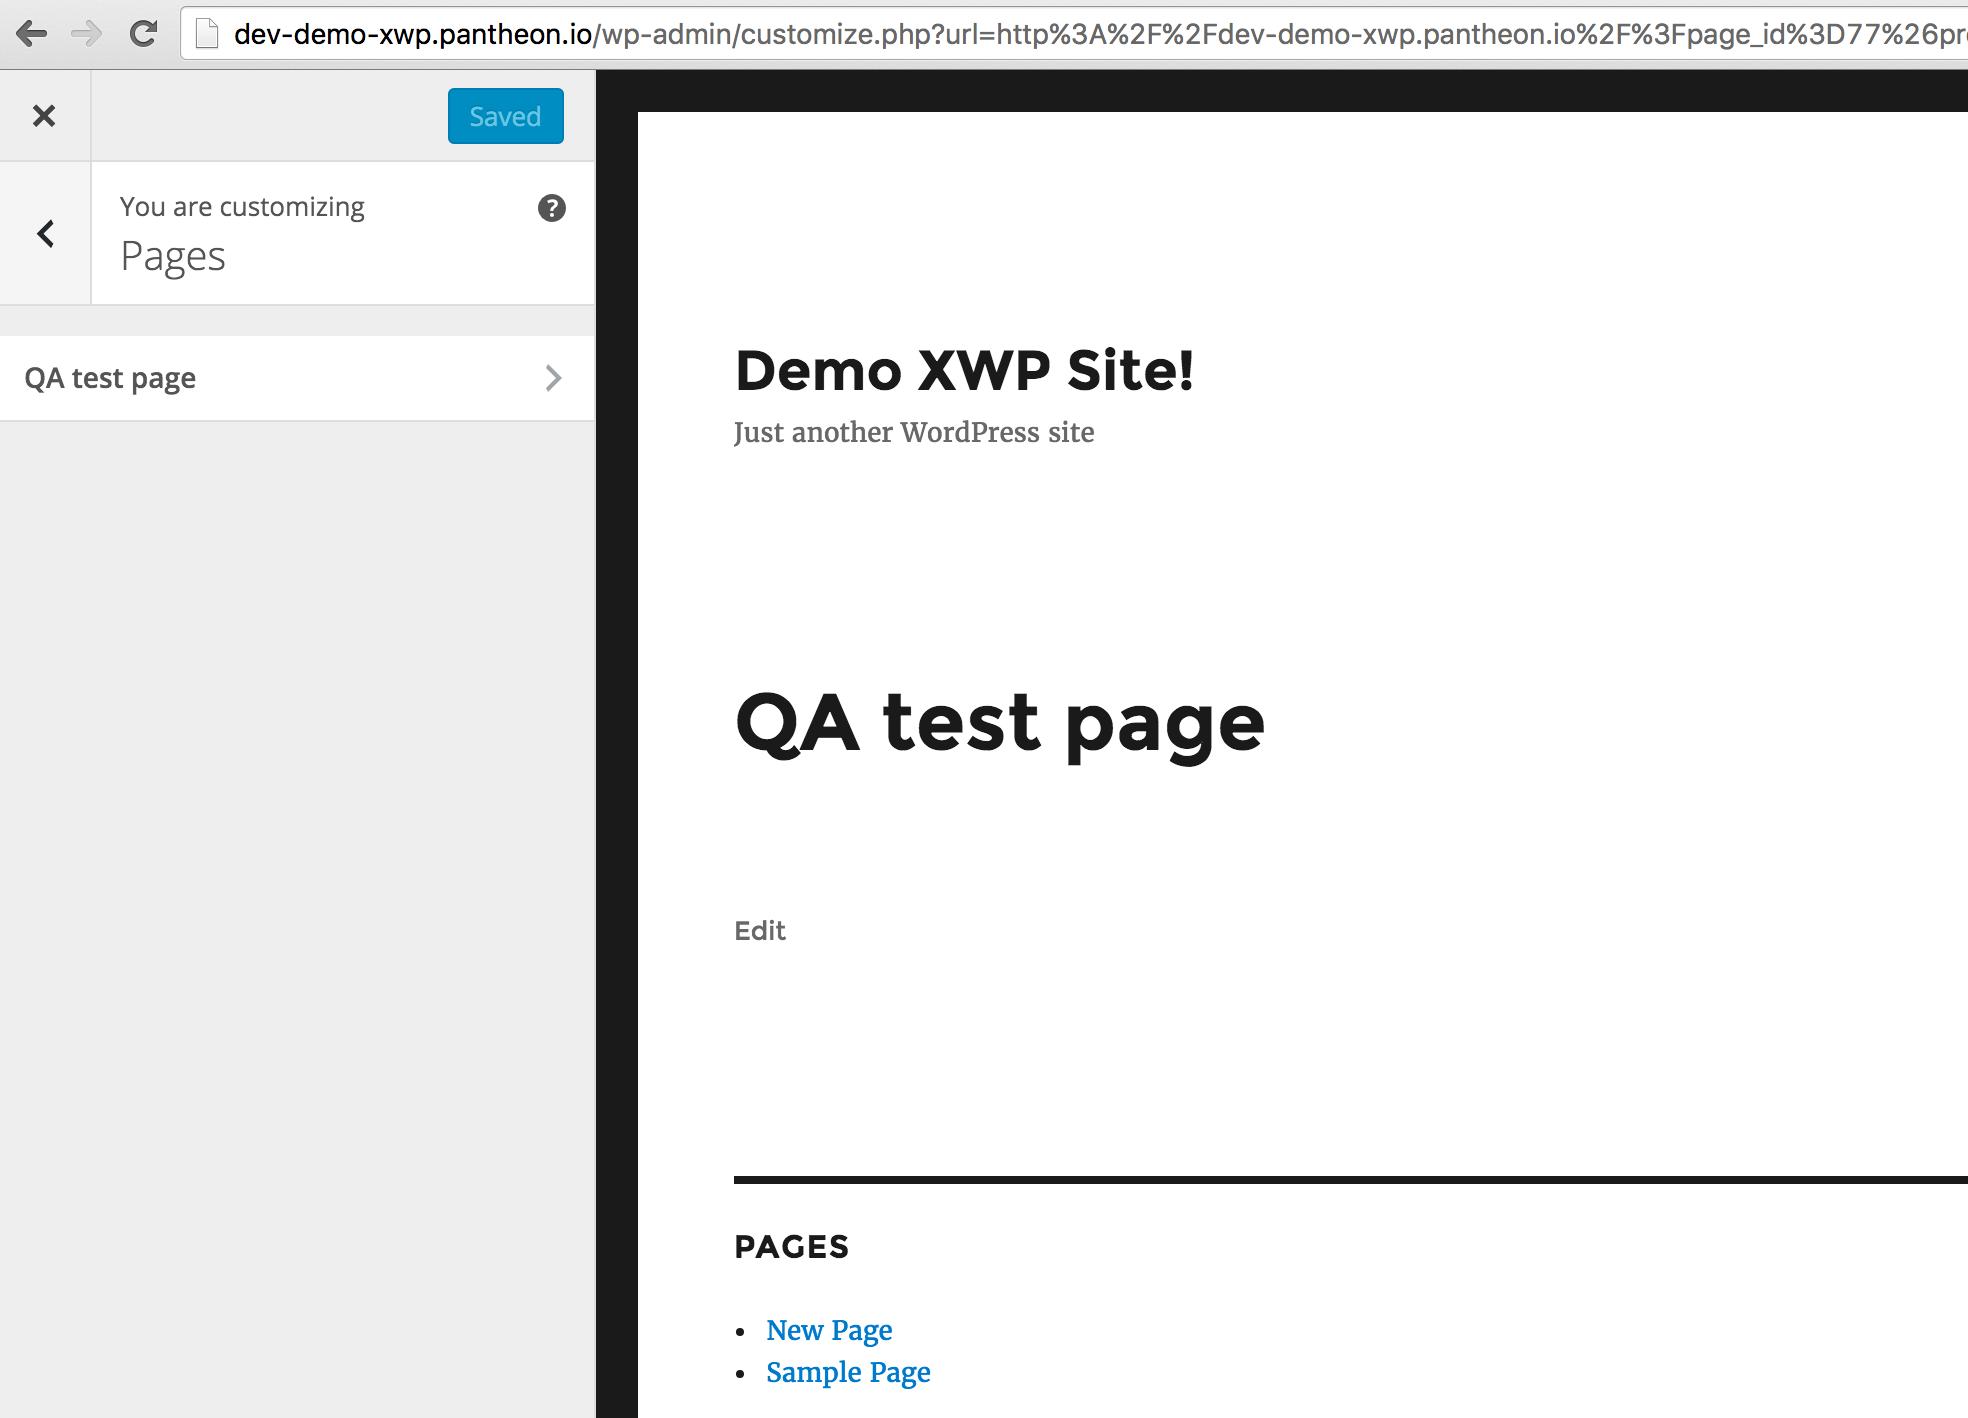 customize_step3_clicknameofpage